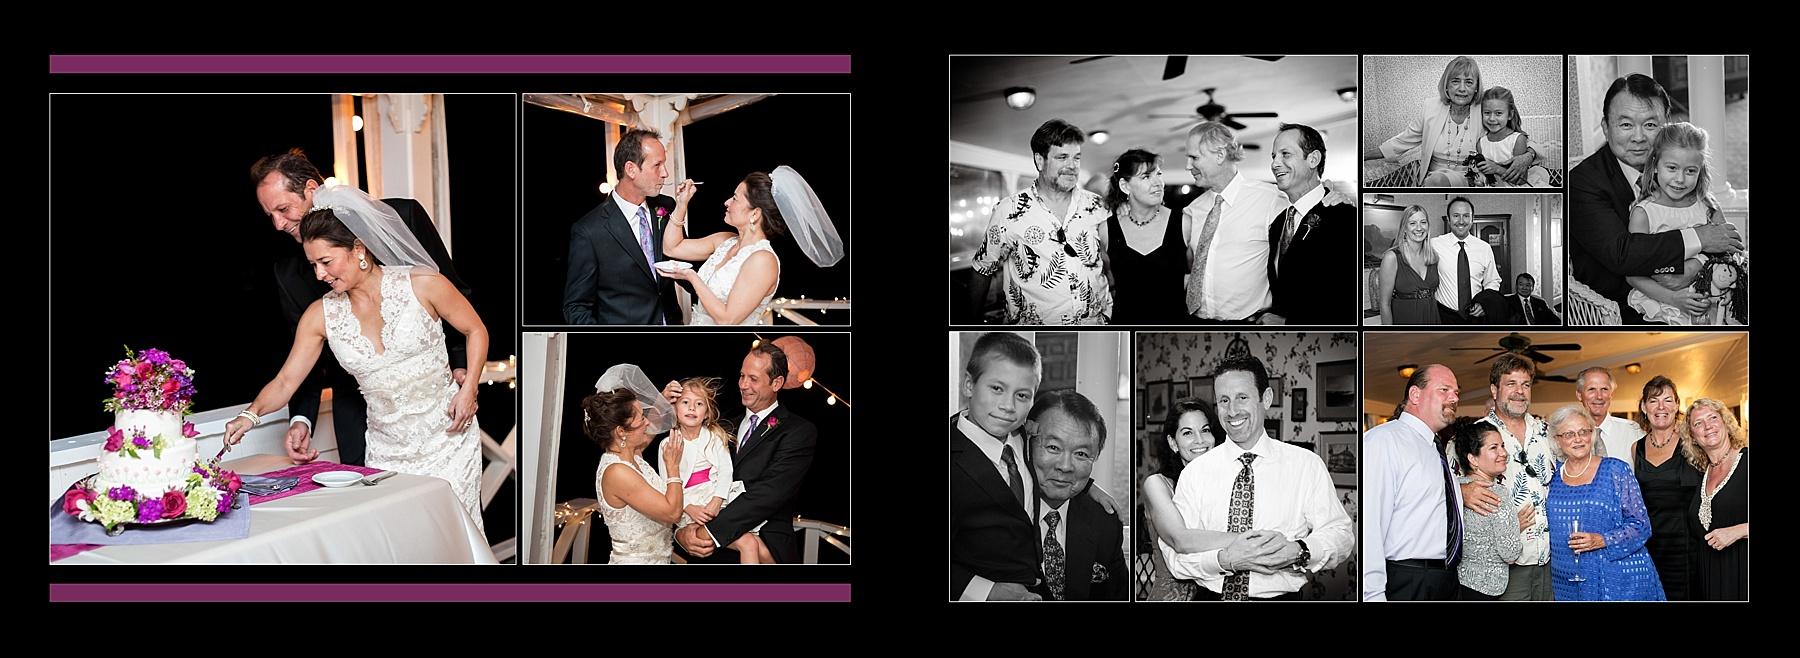 spread16_Wedding Album_Block Island RI WEB.jpg